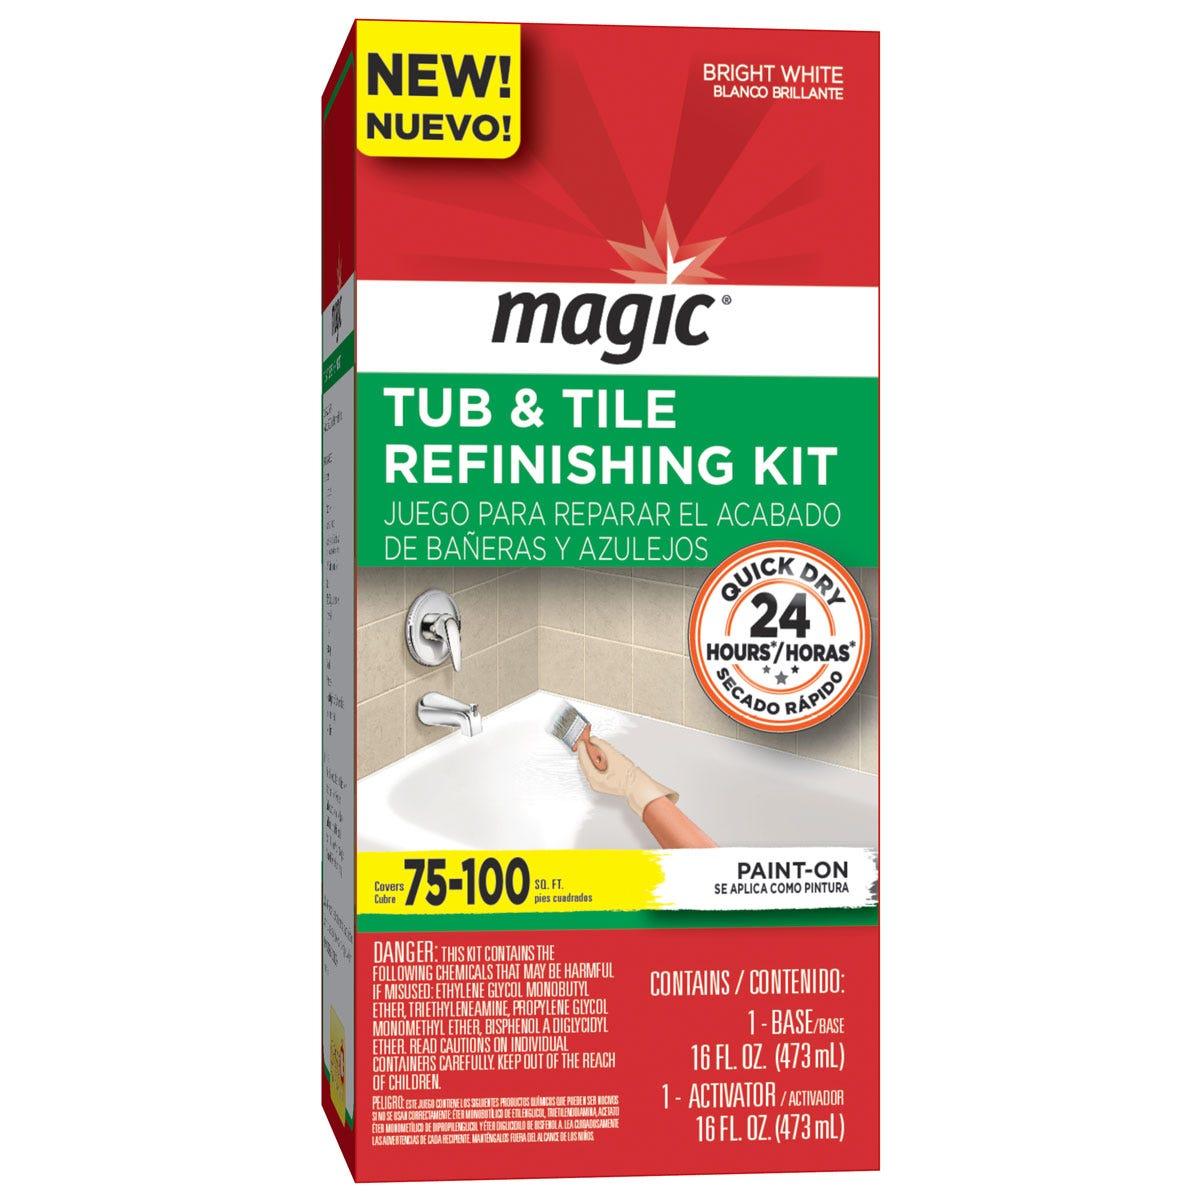 https://googone.com/media/catalog/product/p/a/paint-on-tub-refinishing-kit_front.jpg